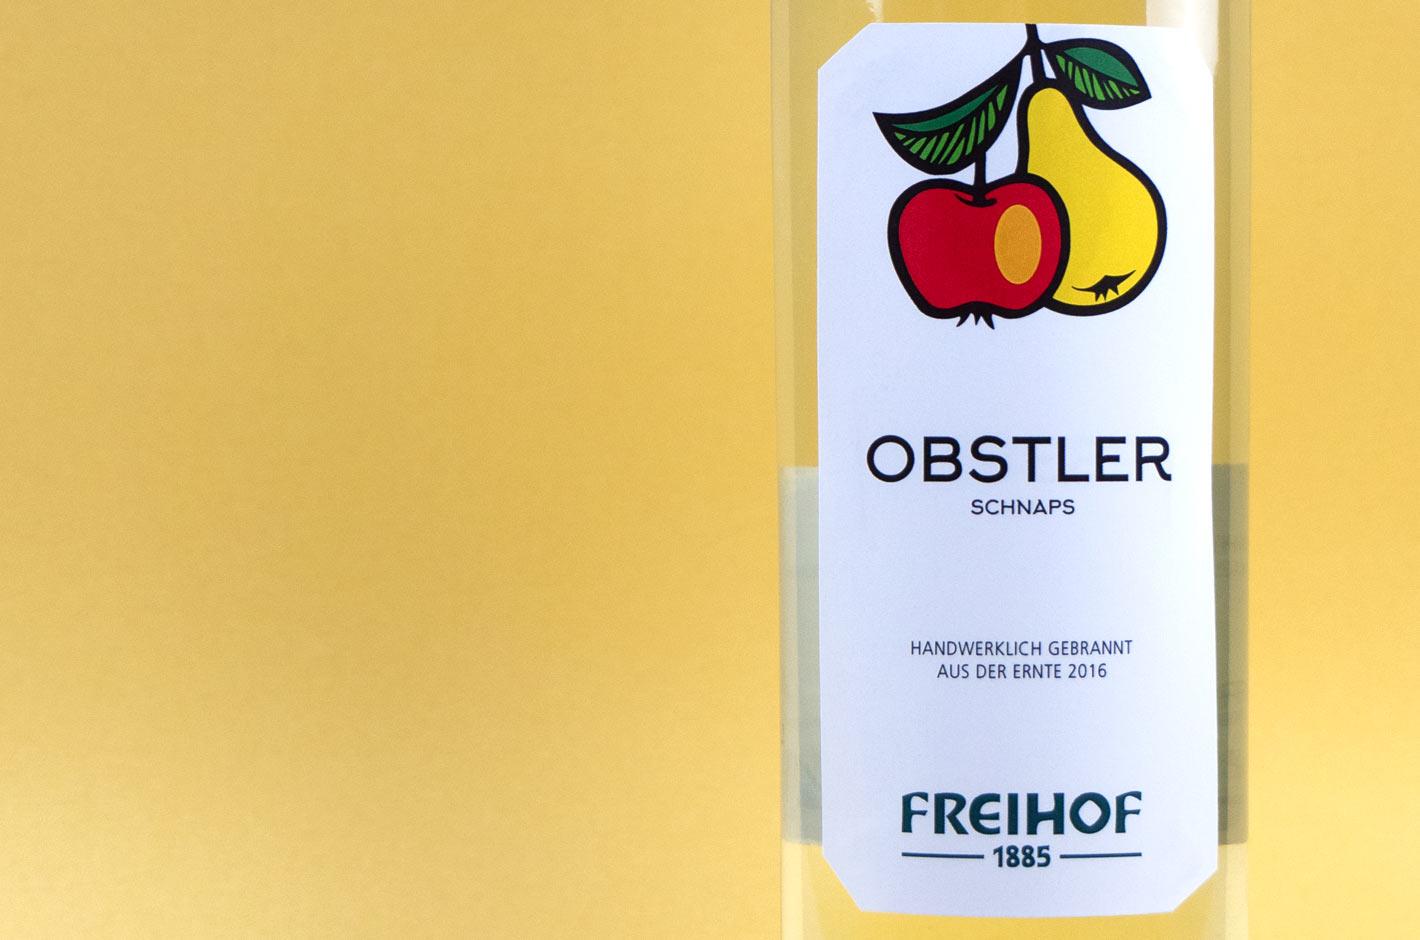 Freihof Obstler Schnaps Etikett Nahaufnahme